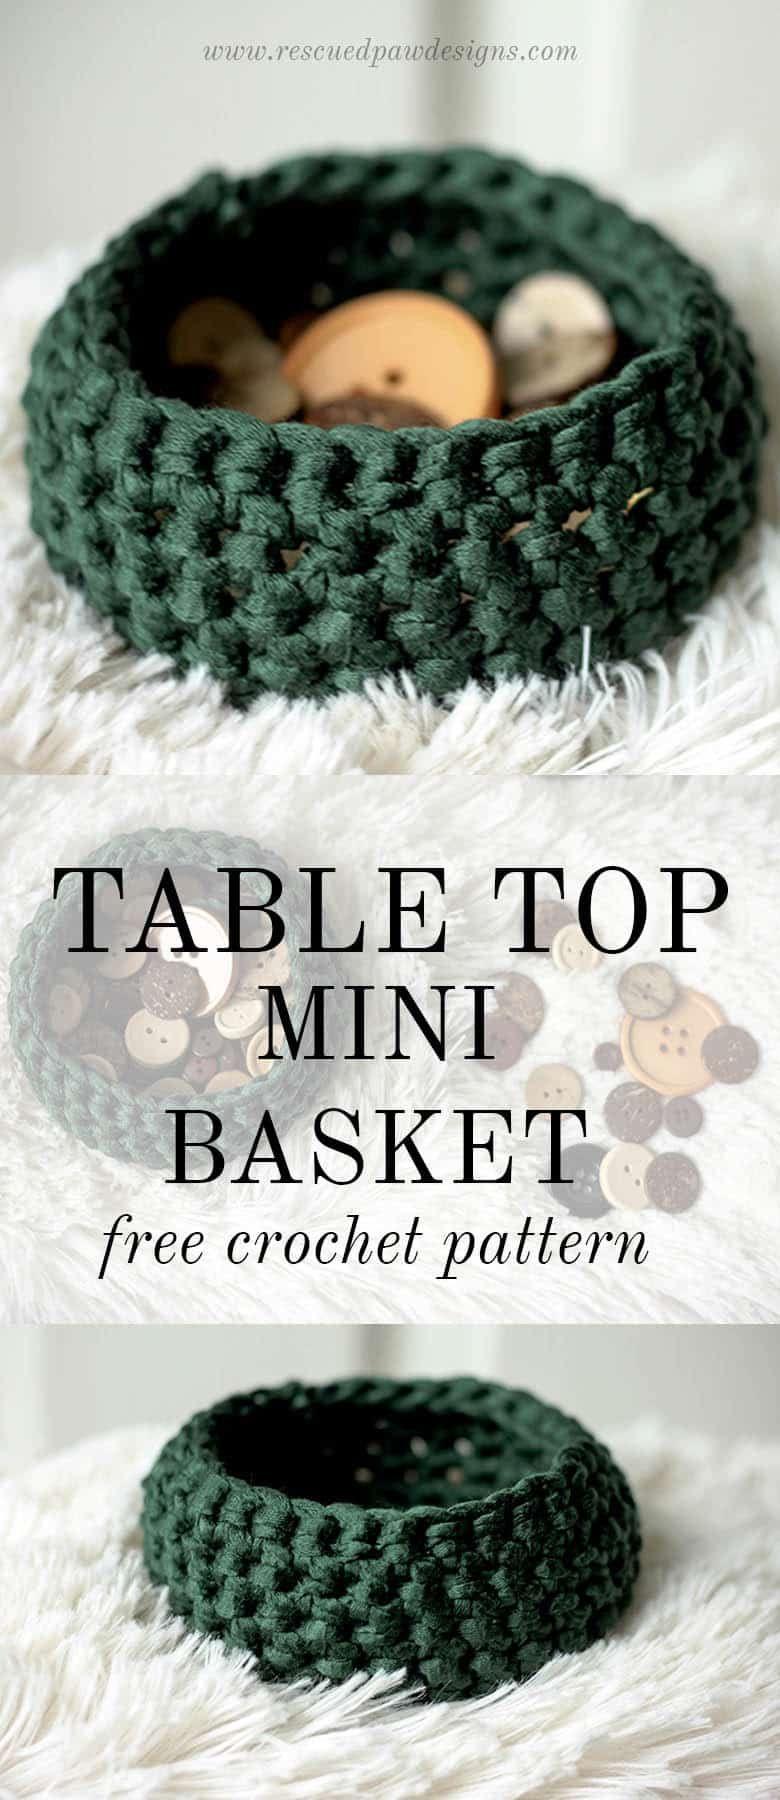 Tina Tape Yarn: Eco-Friendly Tencel Yarn with Great Texture ...